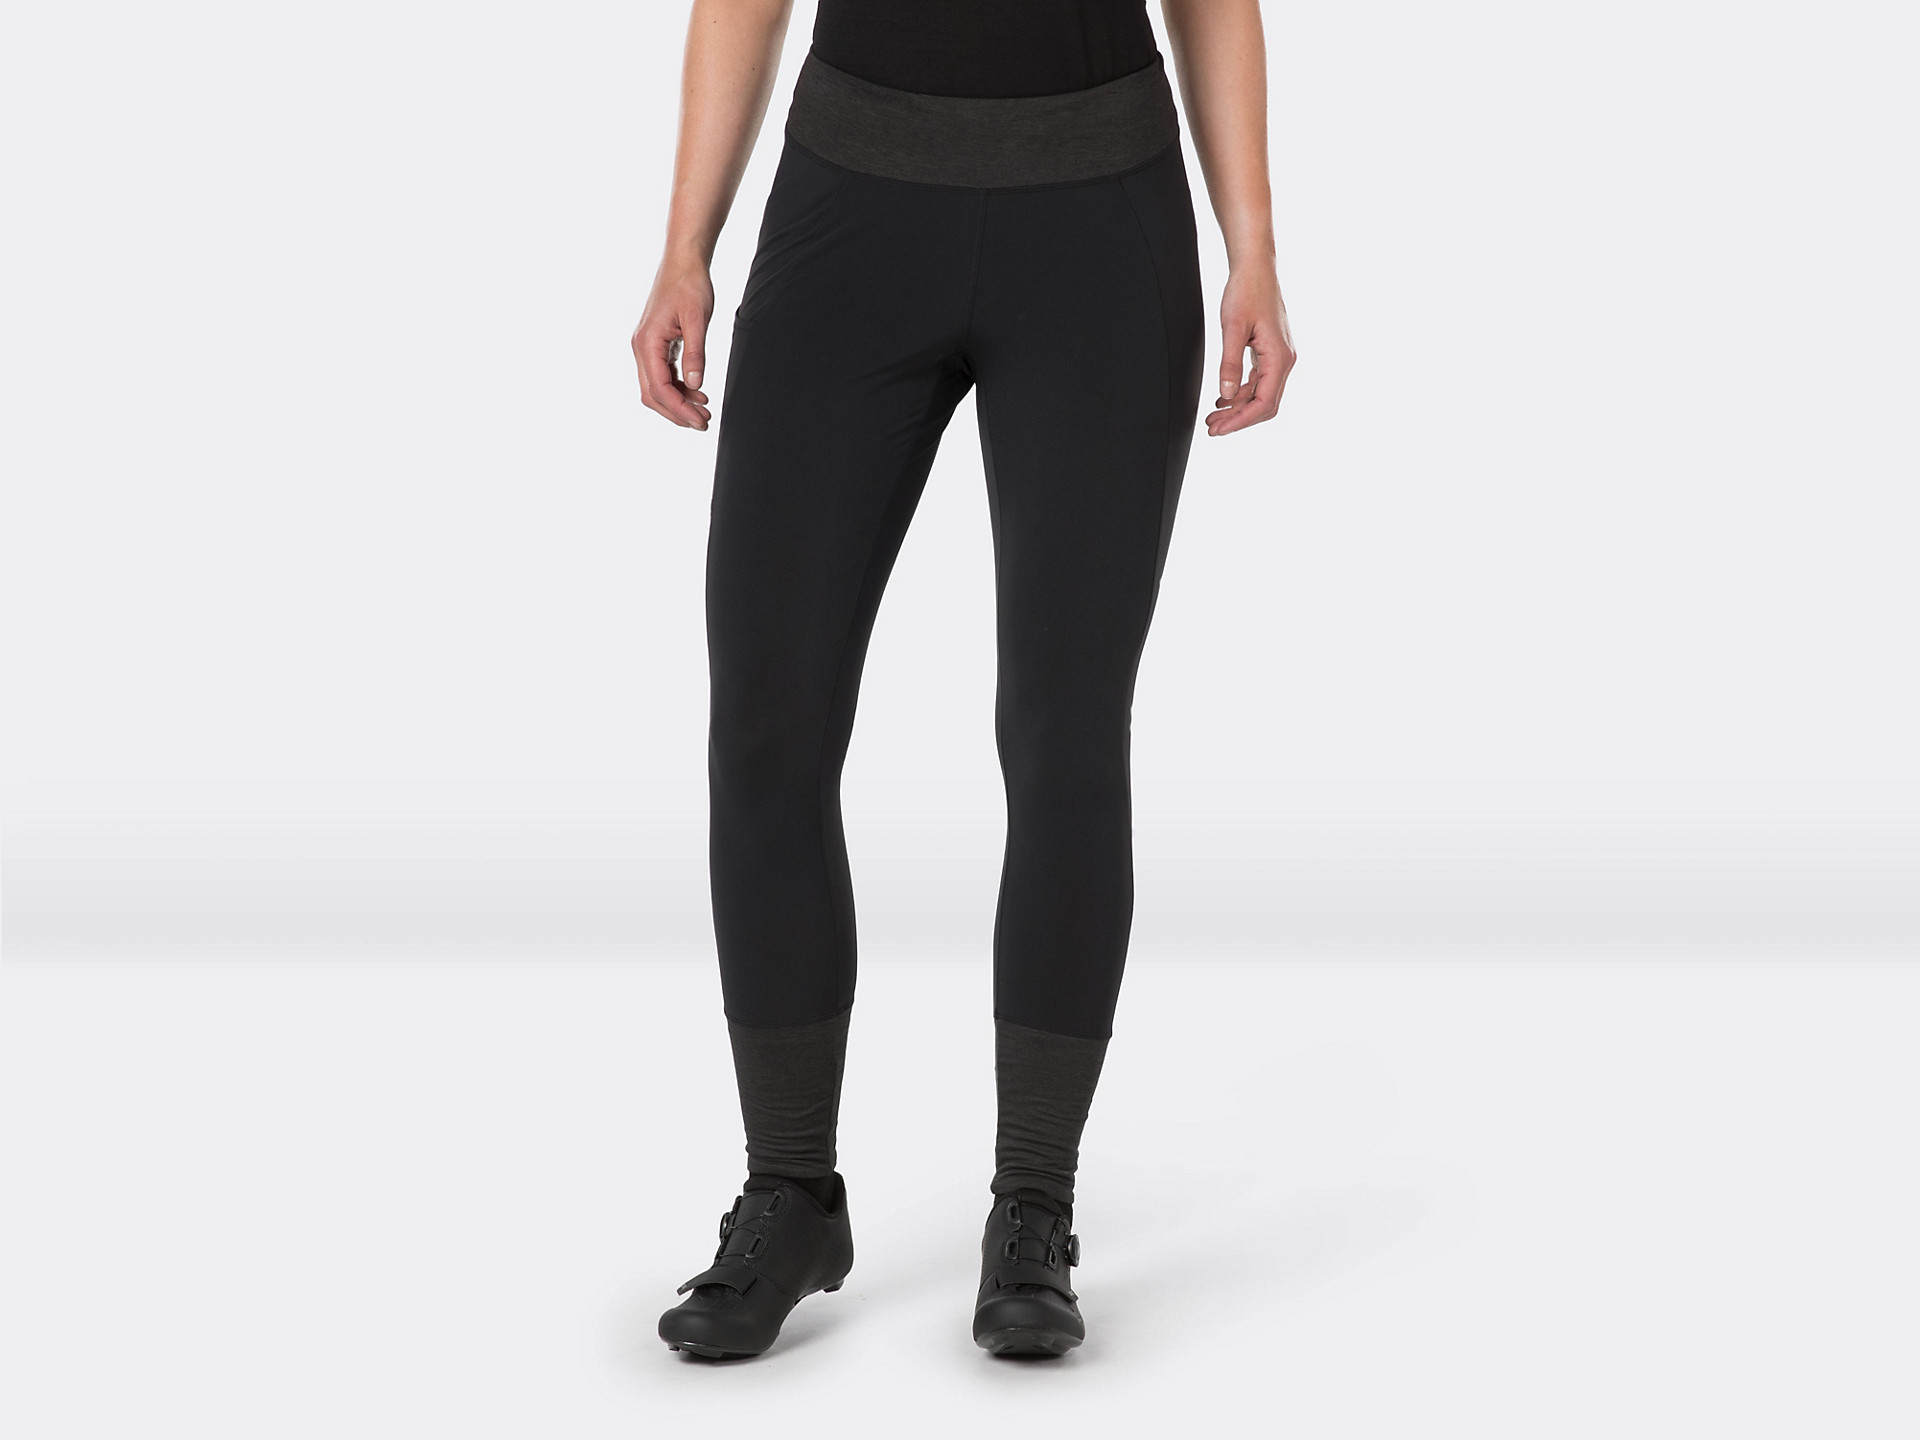 29251ec0d Bontrager Kalia Women s Thermal Fitness Tight